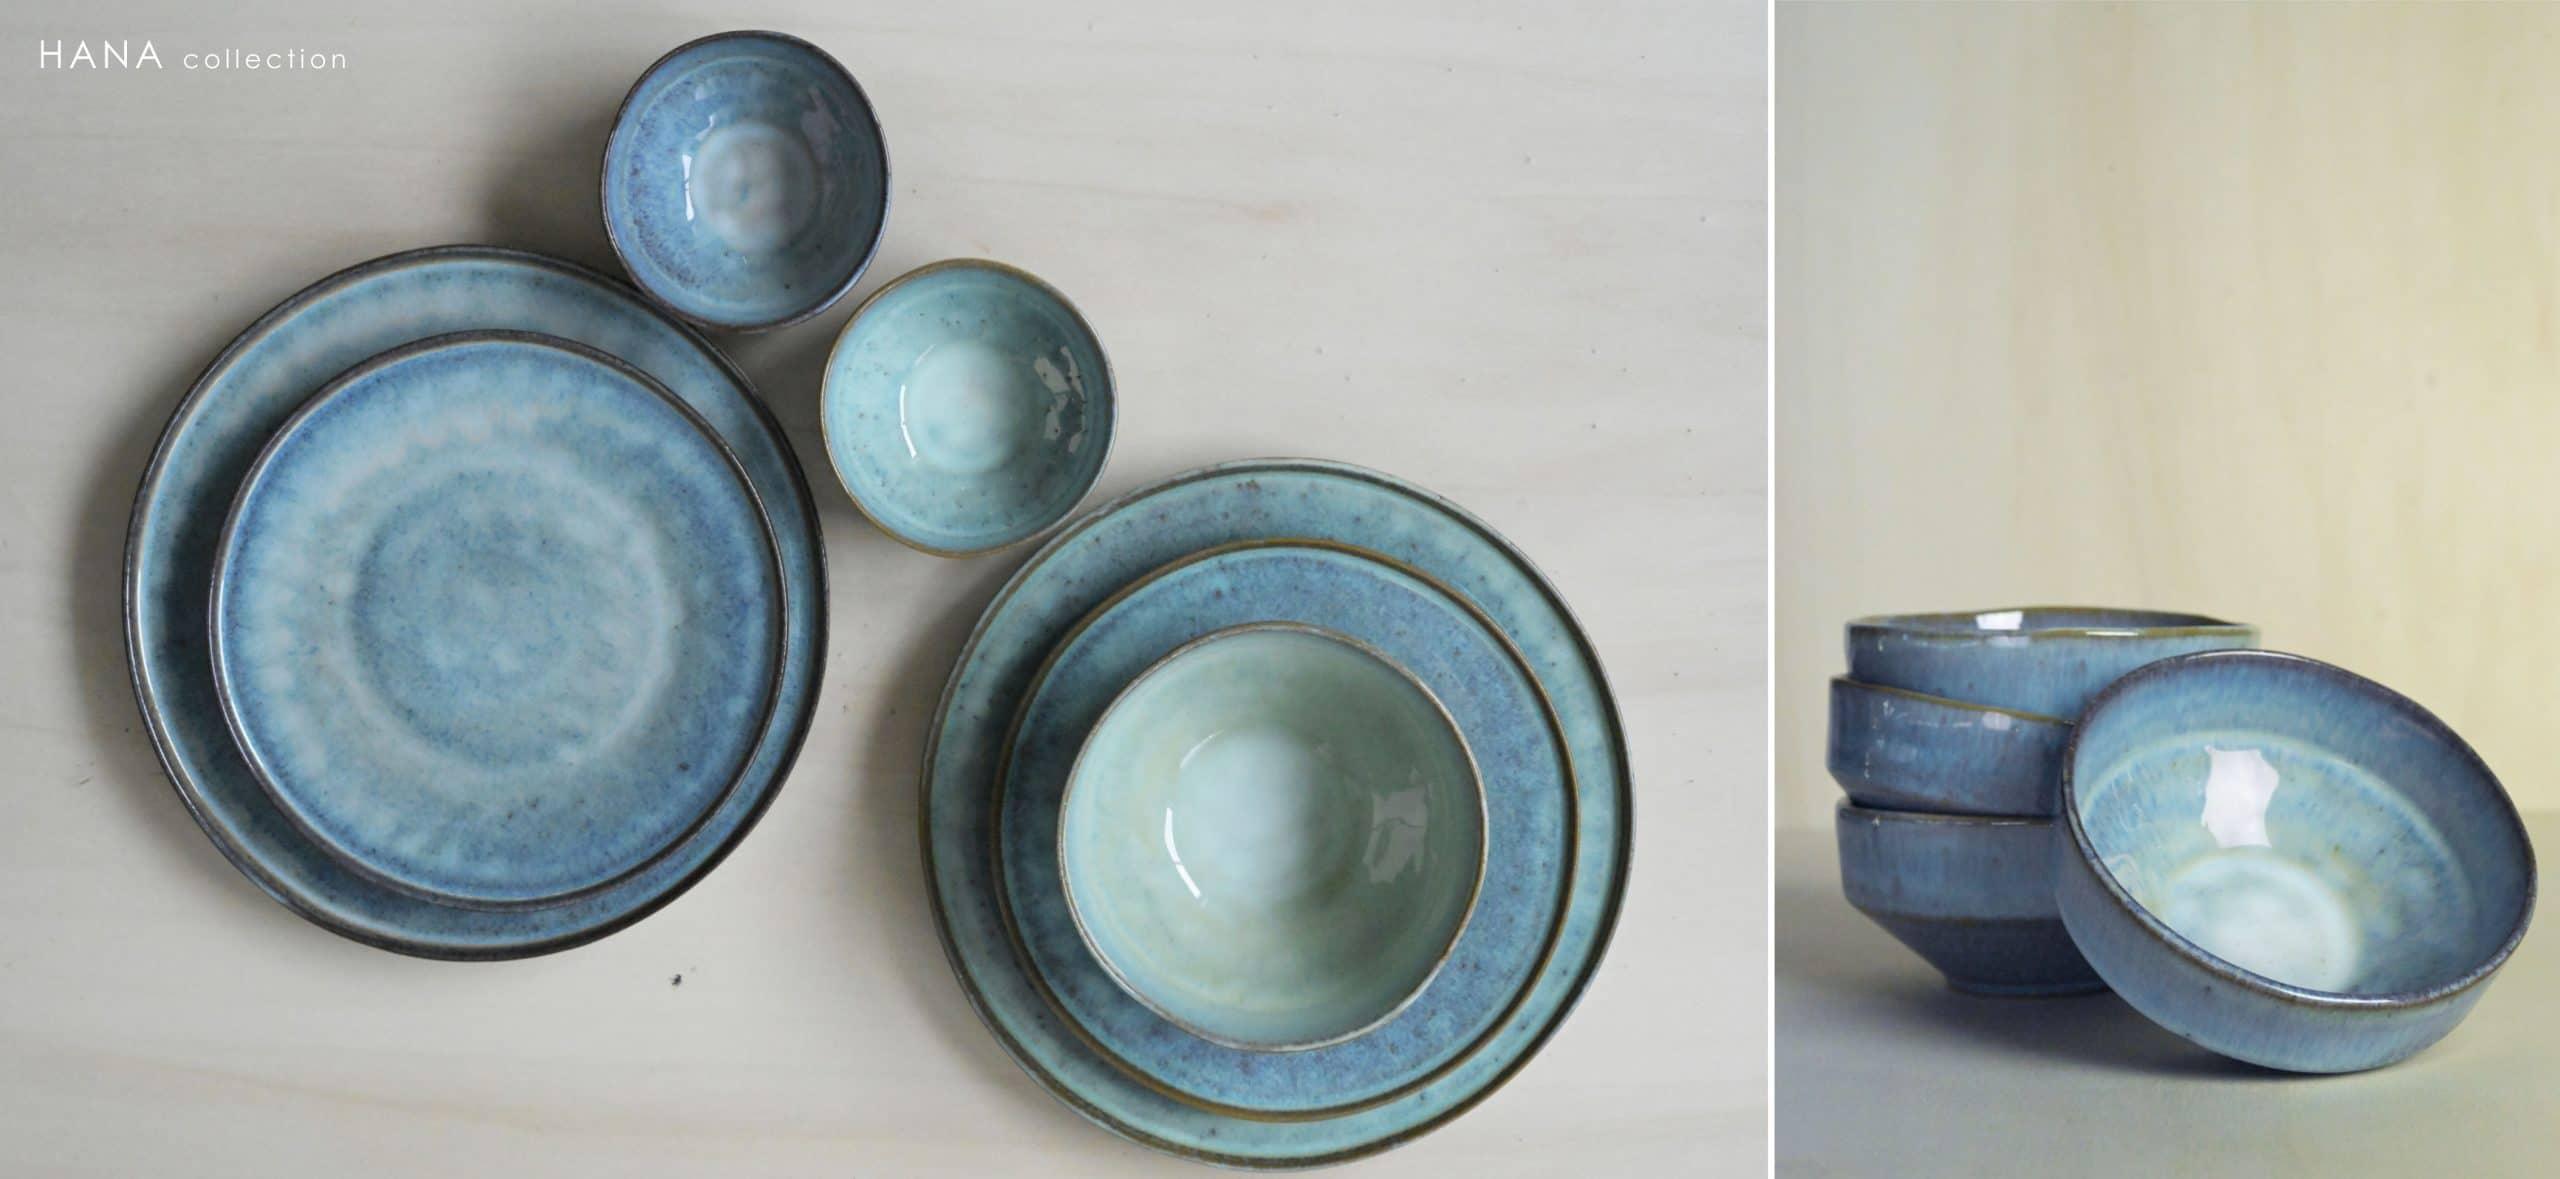 valdosol-stoneware-hana